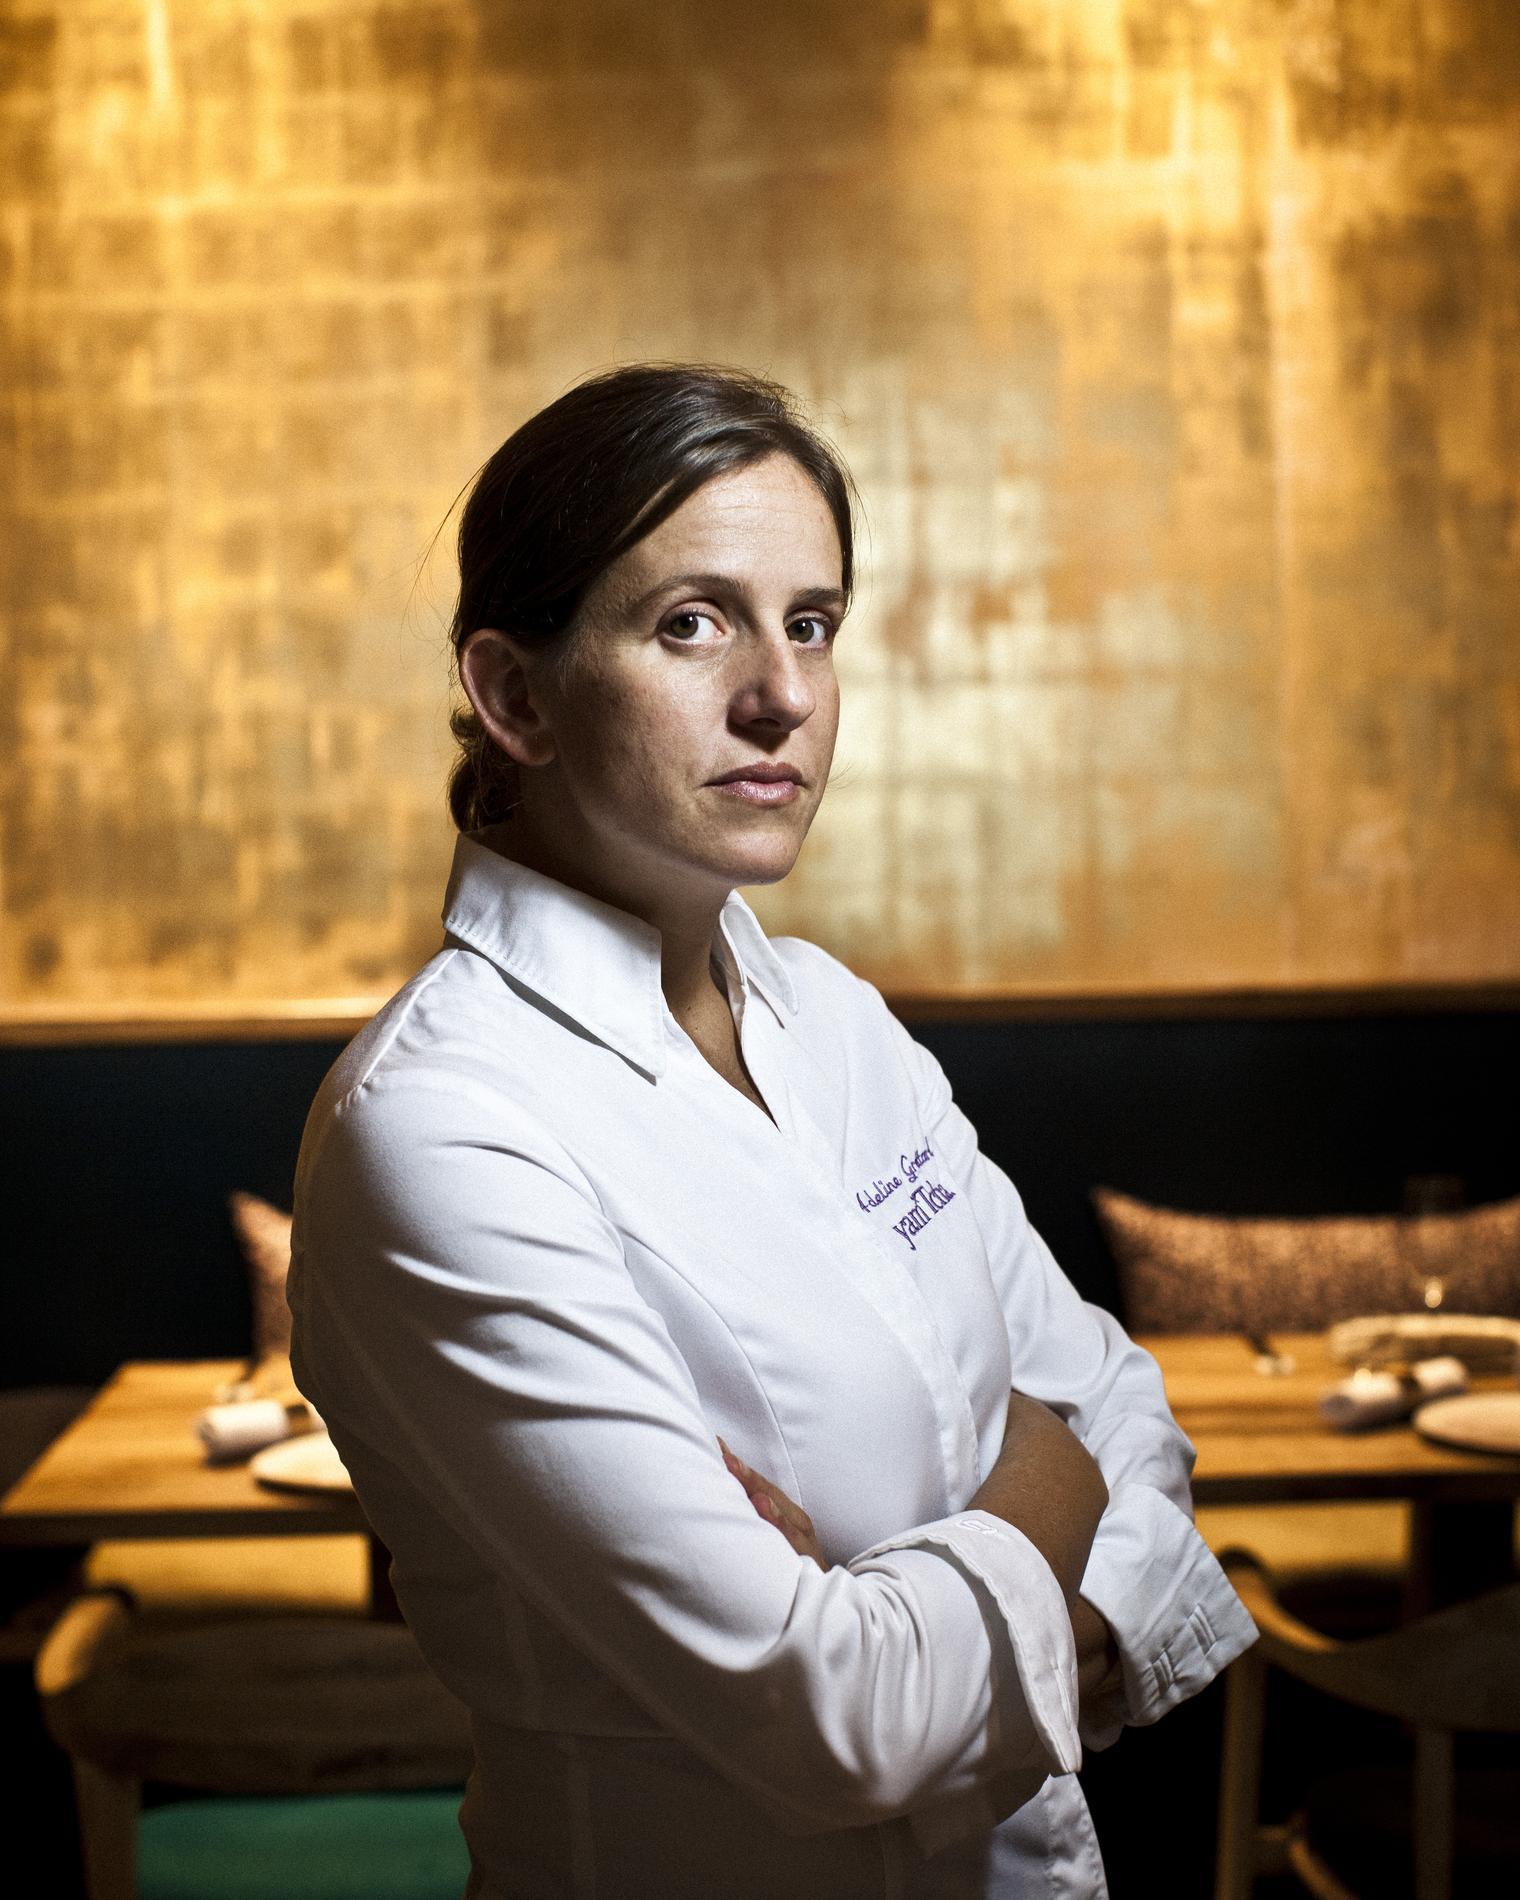 Adeline grattard madame figaro - Devenir professeur de cuisine ...